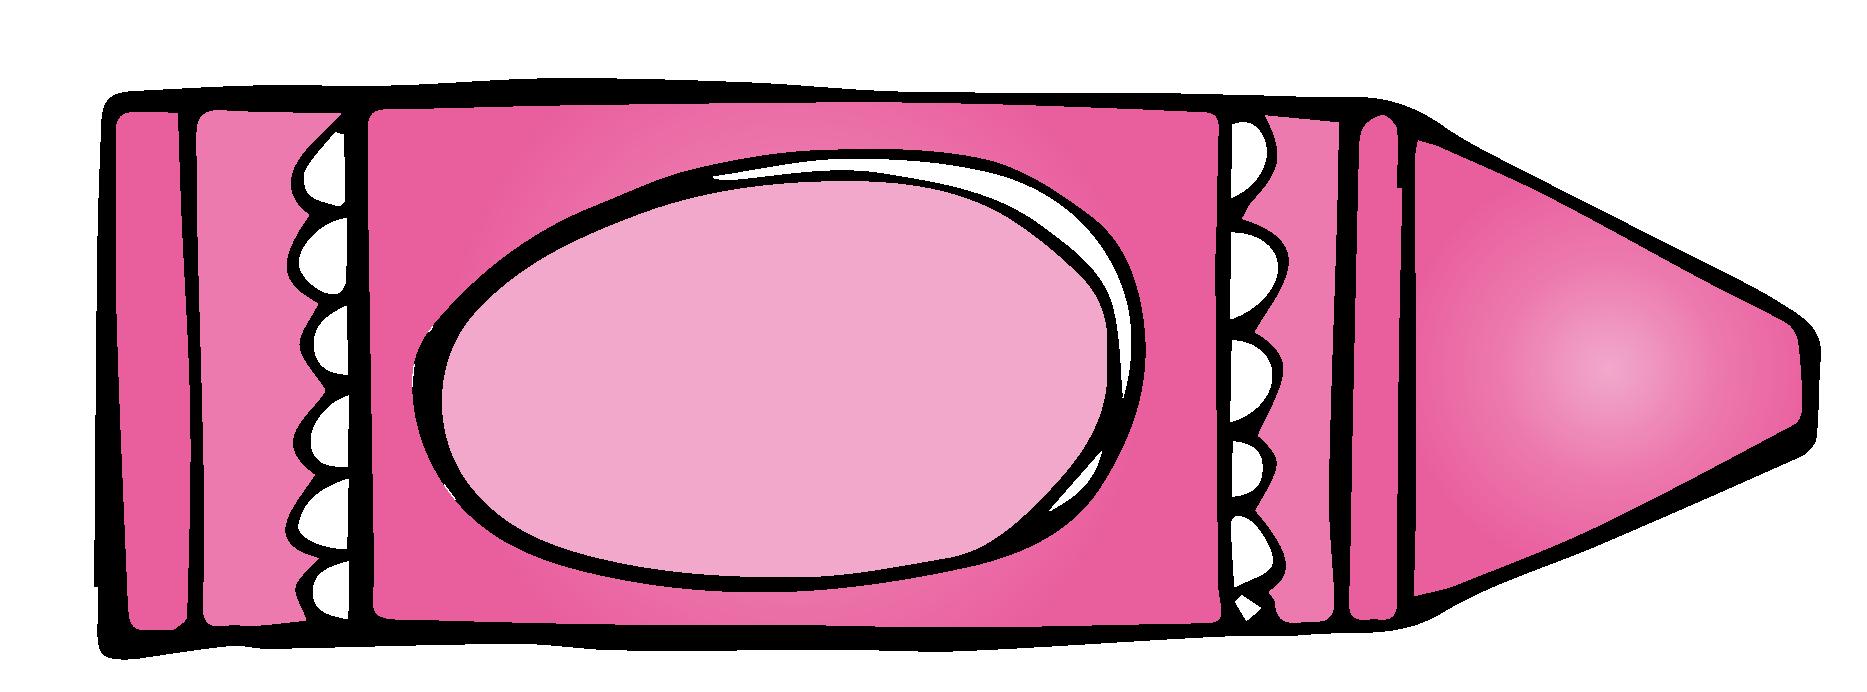 1867x692 Crayon Clipart Pink Crayon